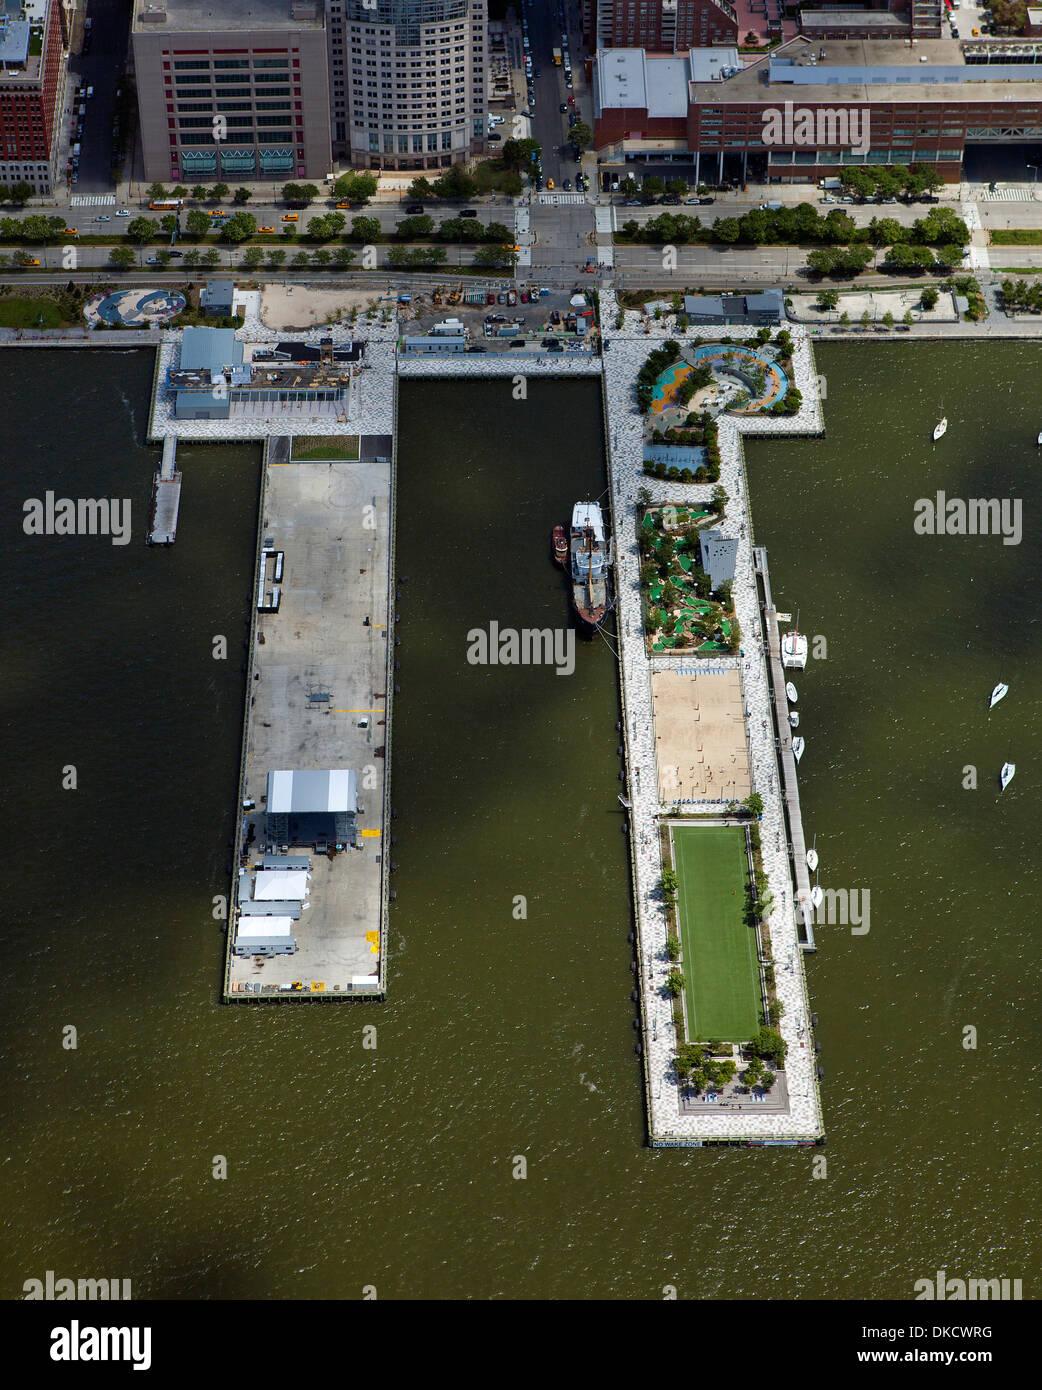 aerial photograph Pier 25, Hudson River Park, Lower Manhattan, New York City - Stock Image